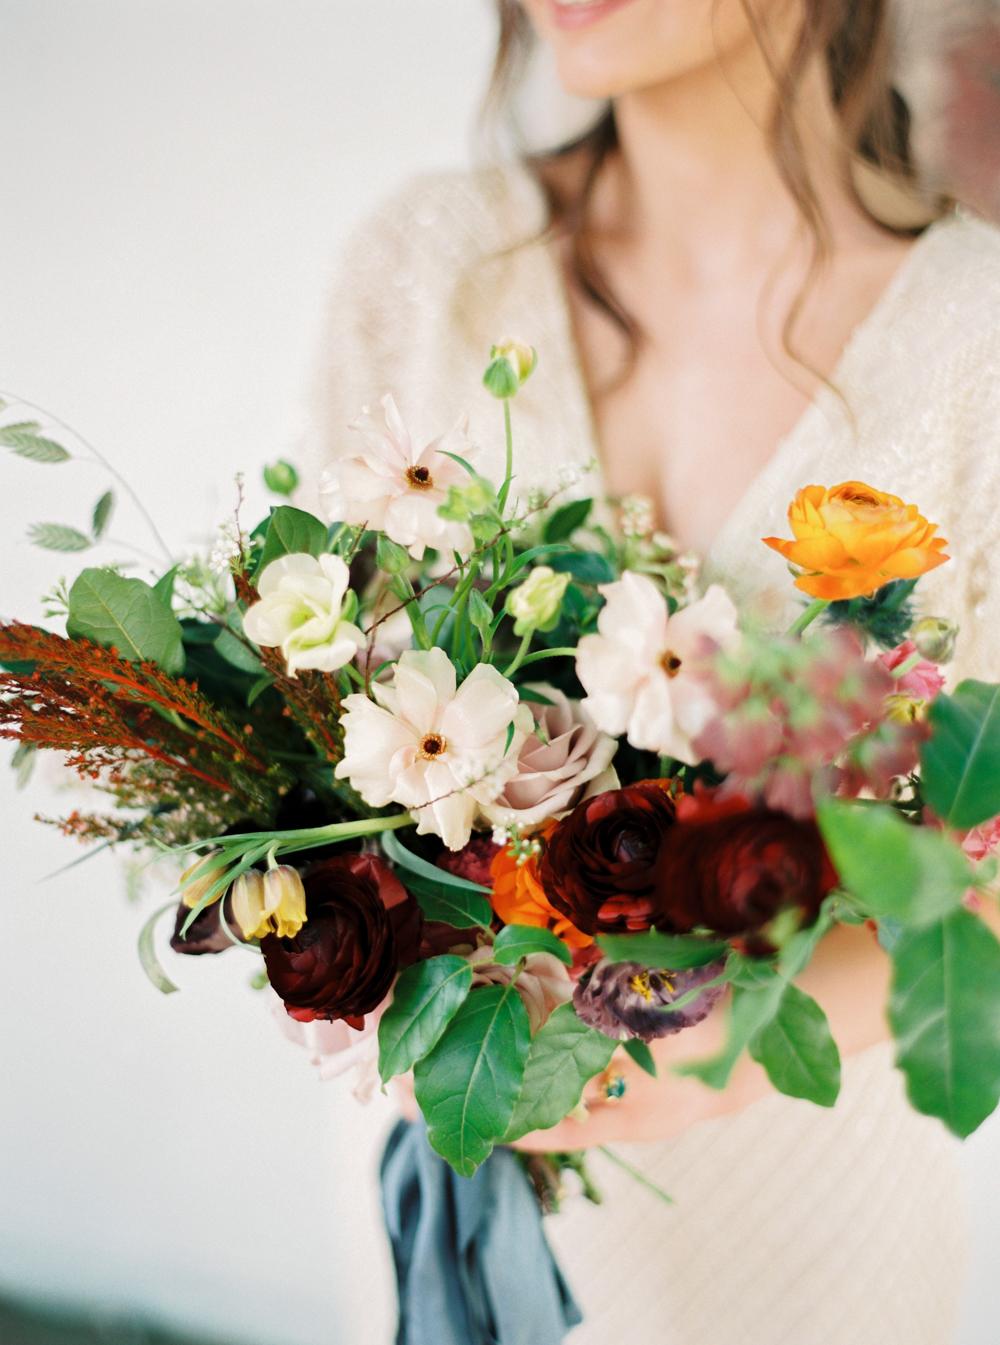 moroccan_floral_boho_vibrant_jewel_tone_nuetral_industrial_wedding_inspiration004.jpg